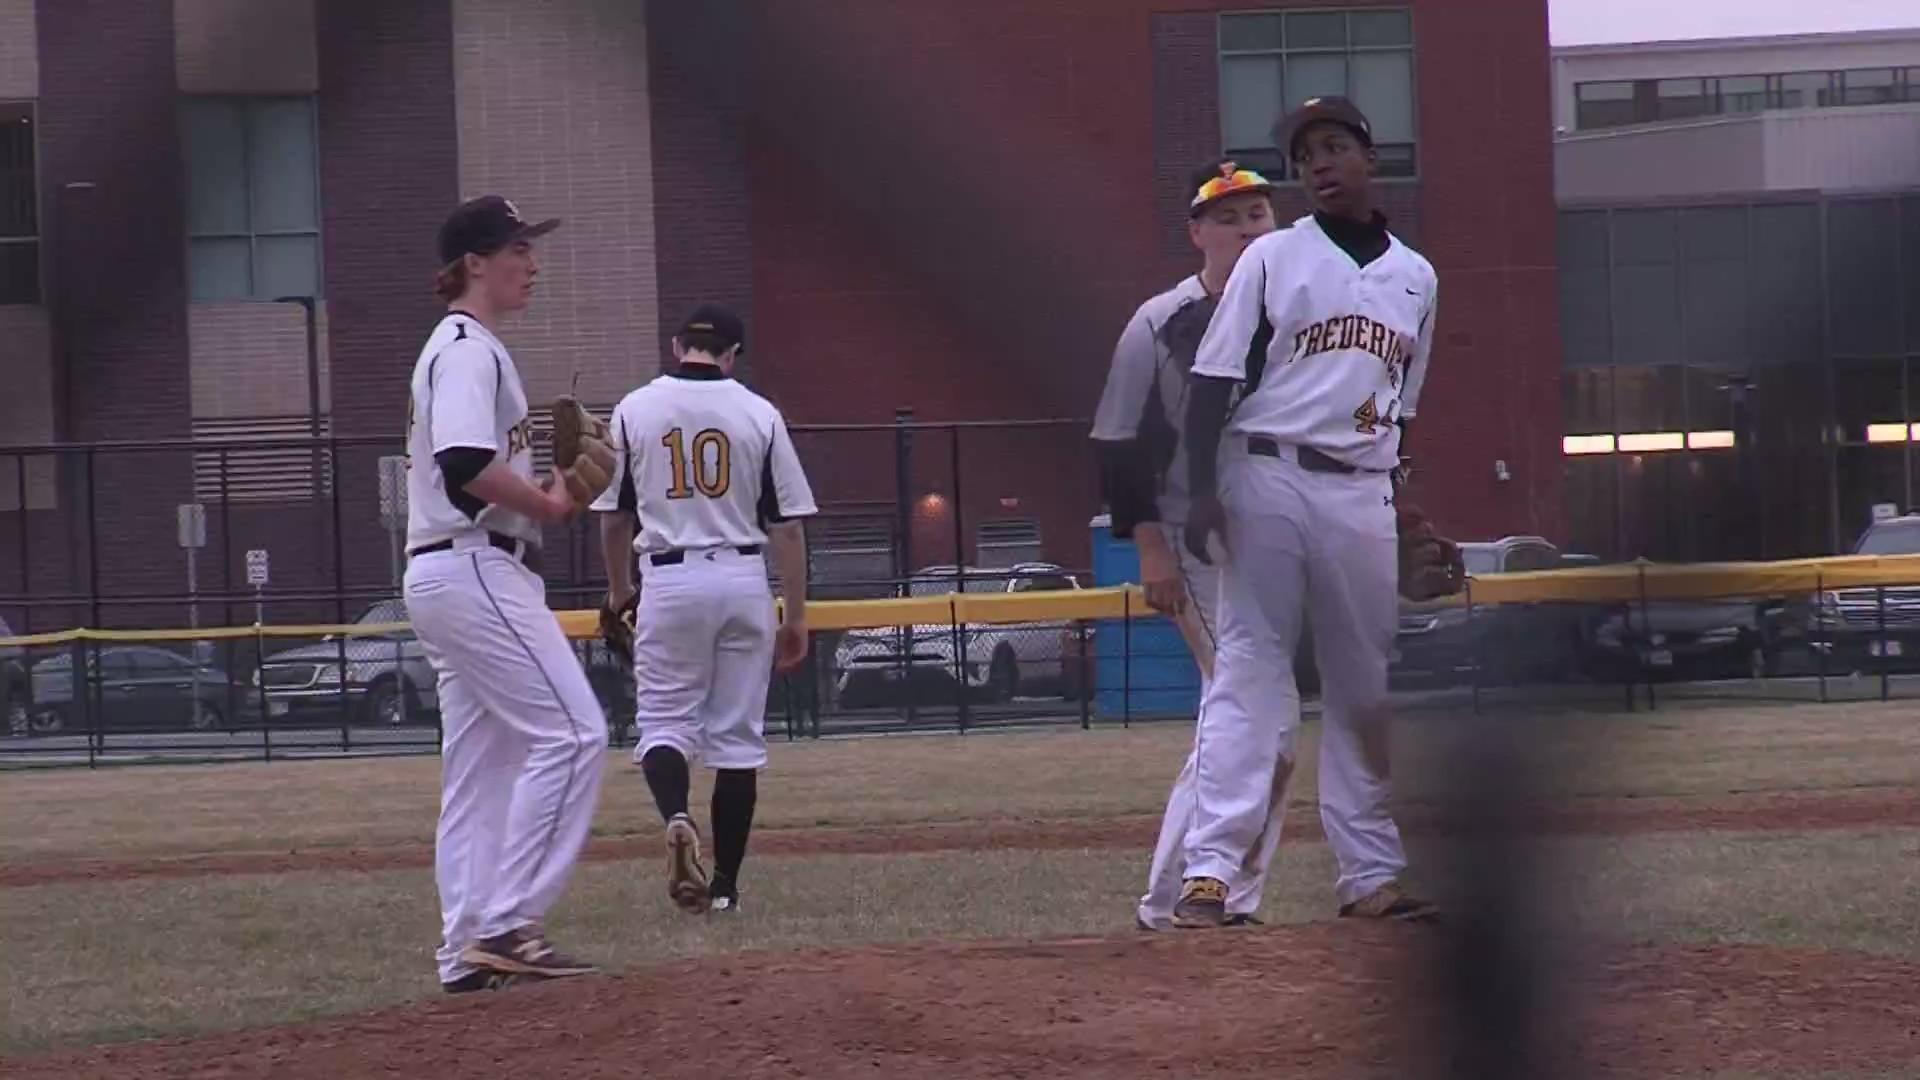 Tuscarora_vs__Frederick_Baseball_0_20190330041142